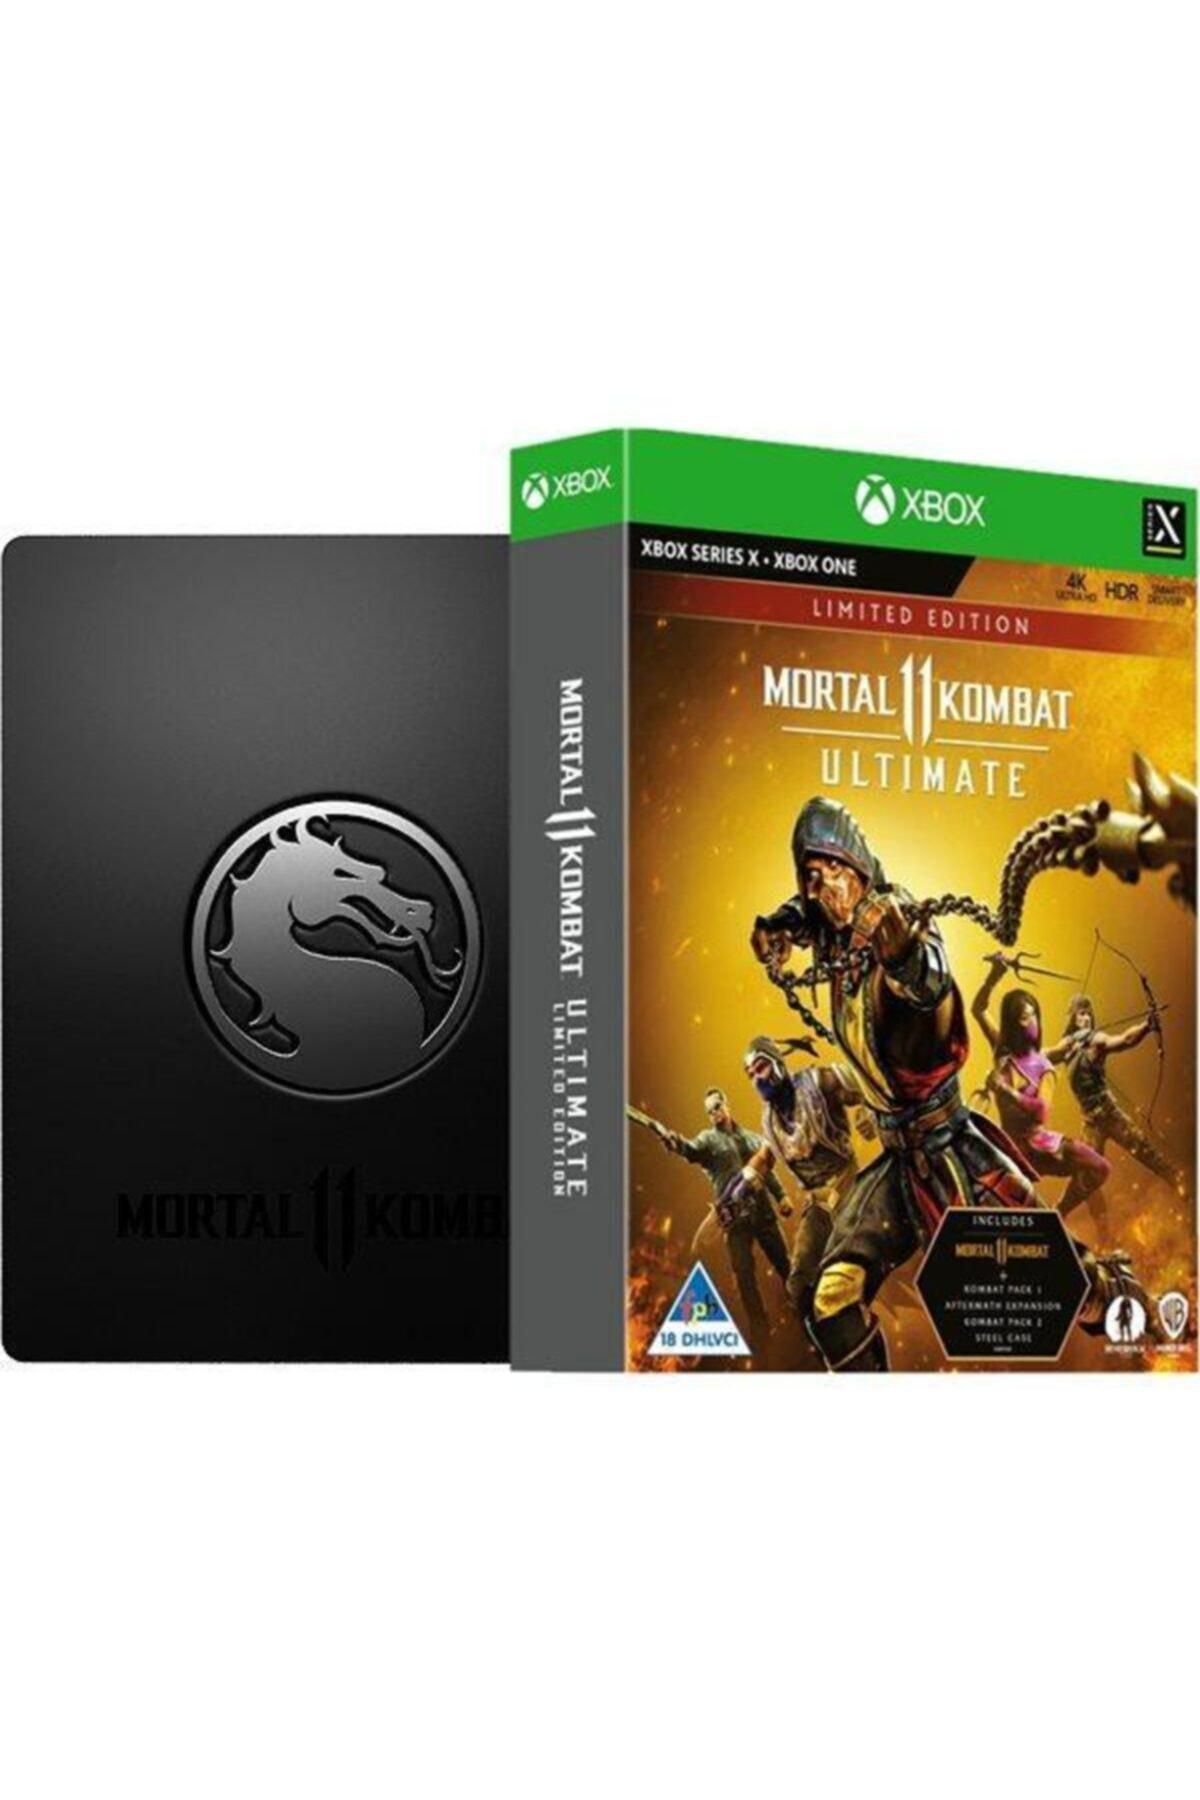 Warner Bros Mortal Kombat 11 Ultimate Limited Edition Xbox One Series X 1